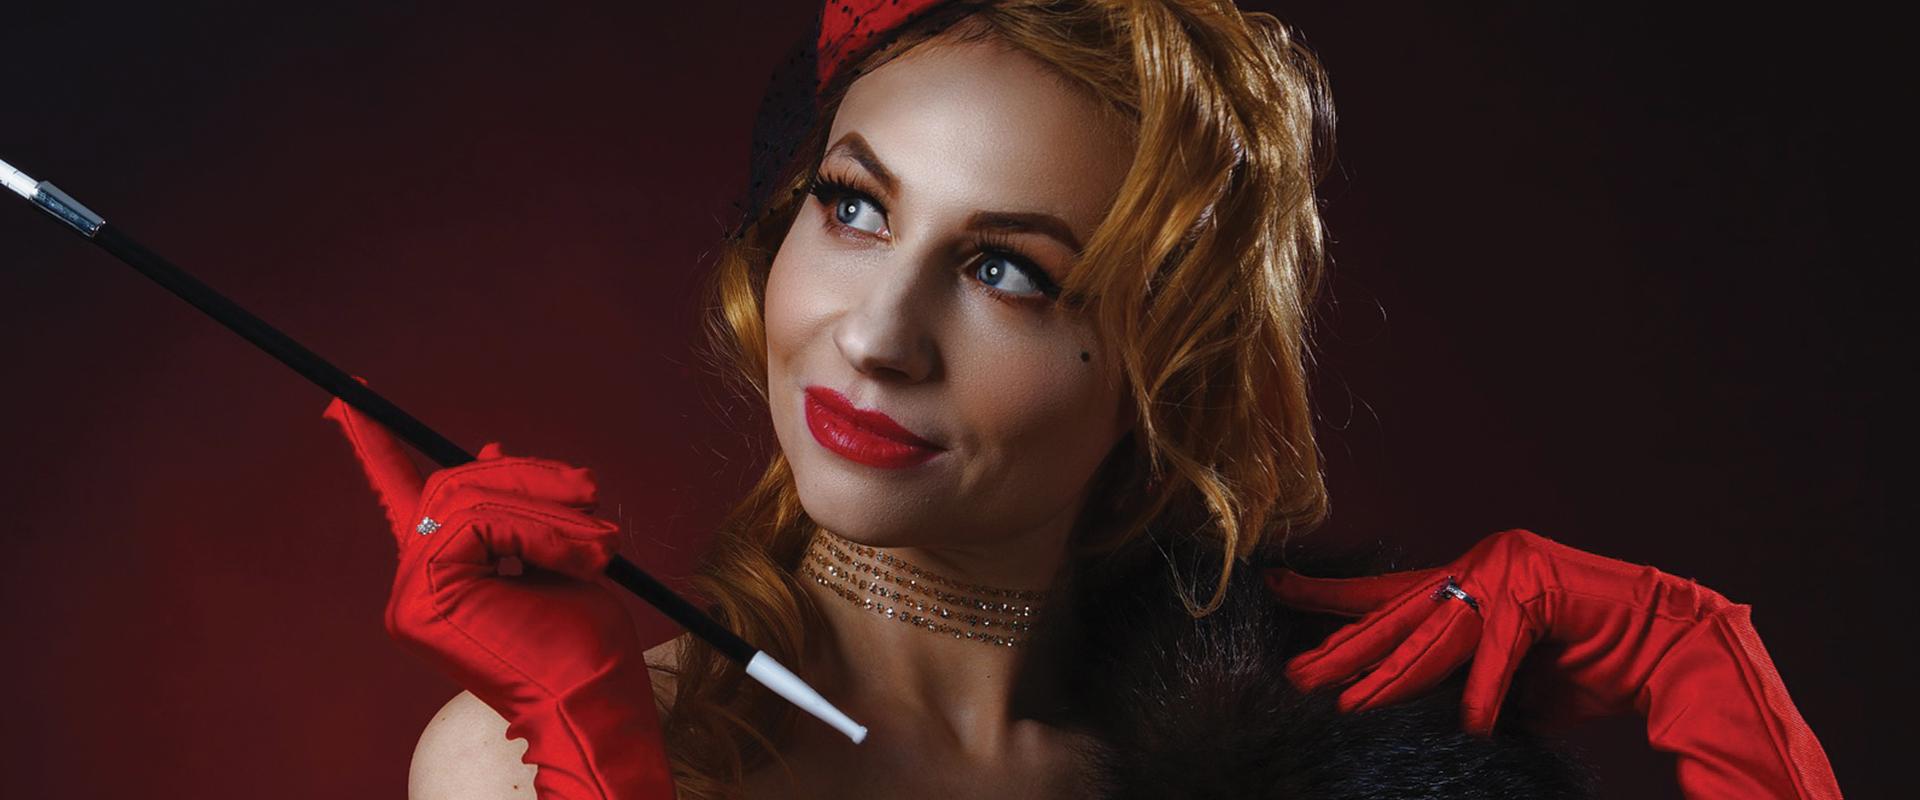 Stock photograph of a cabaret dancer